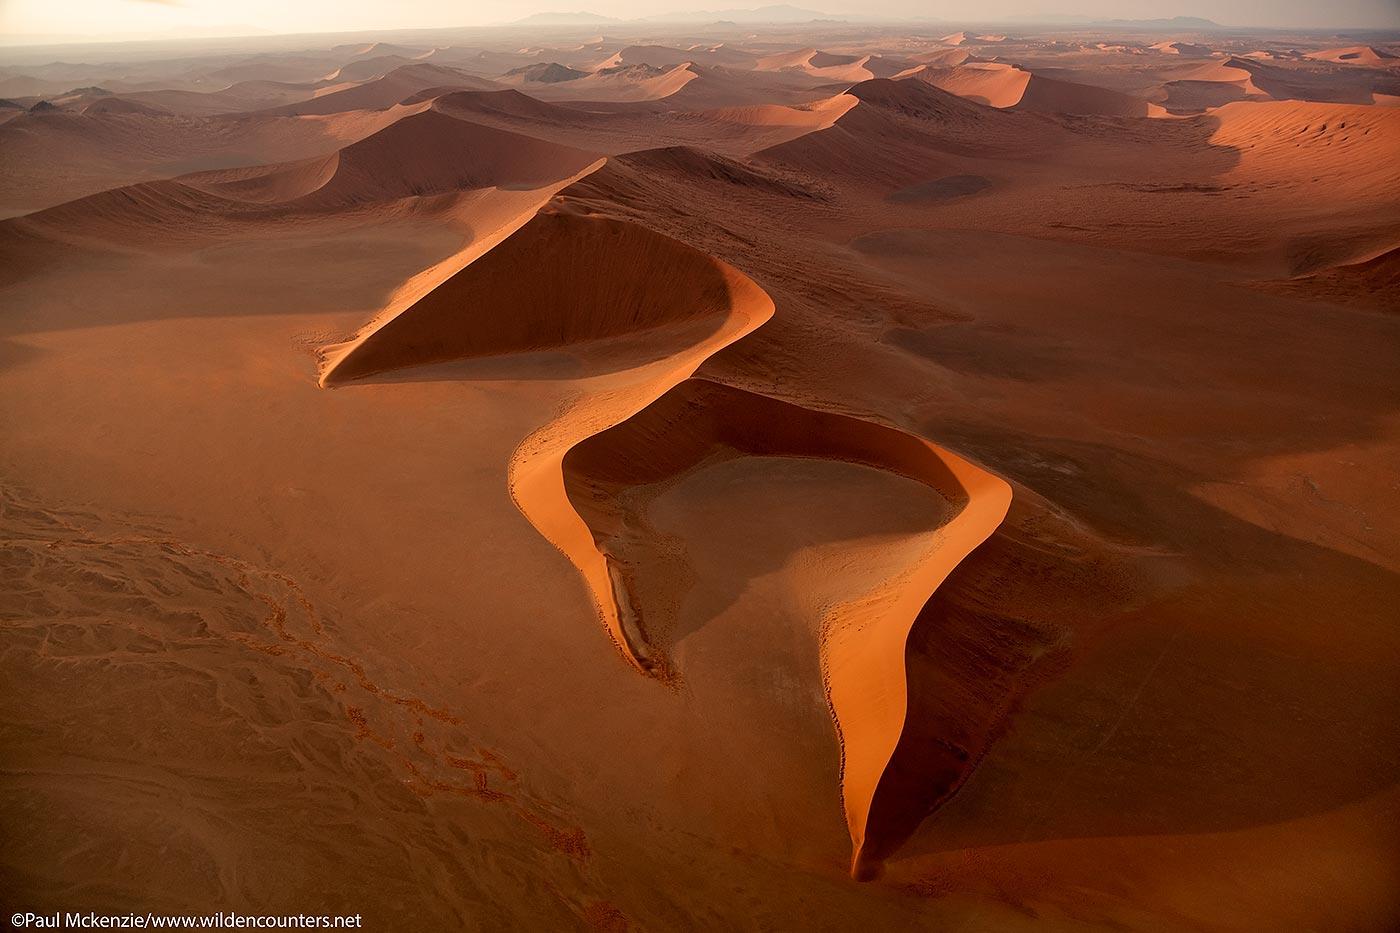 Namibia - Wildencounters